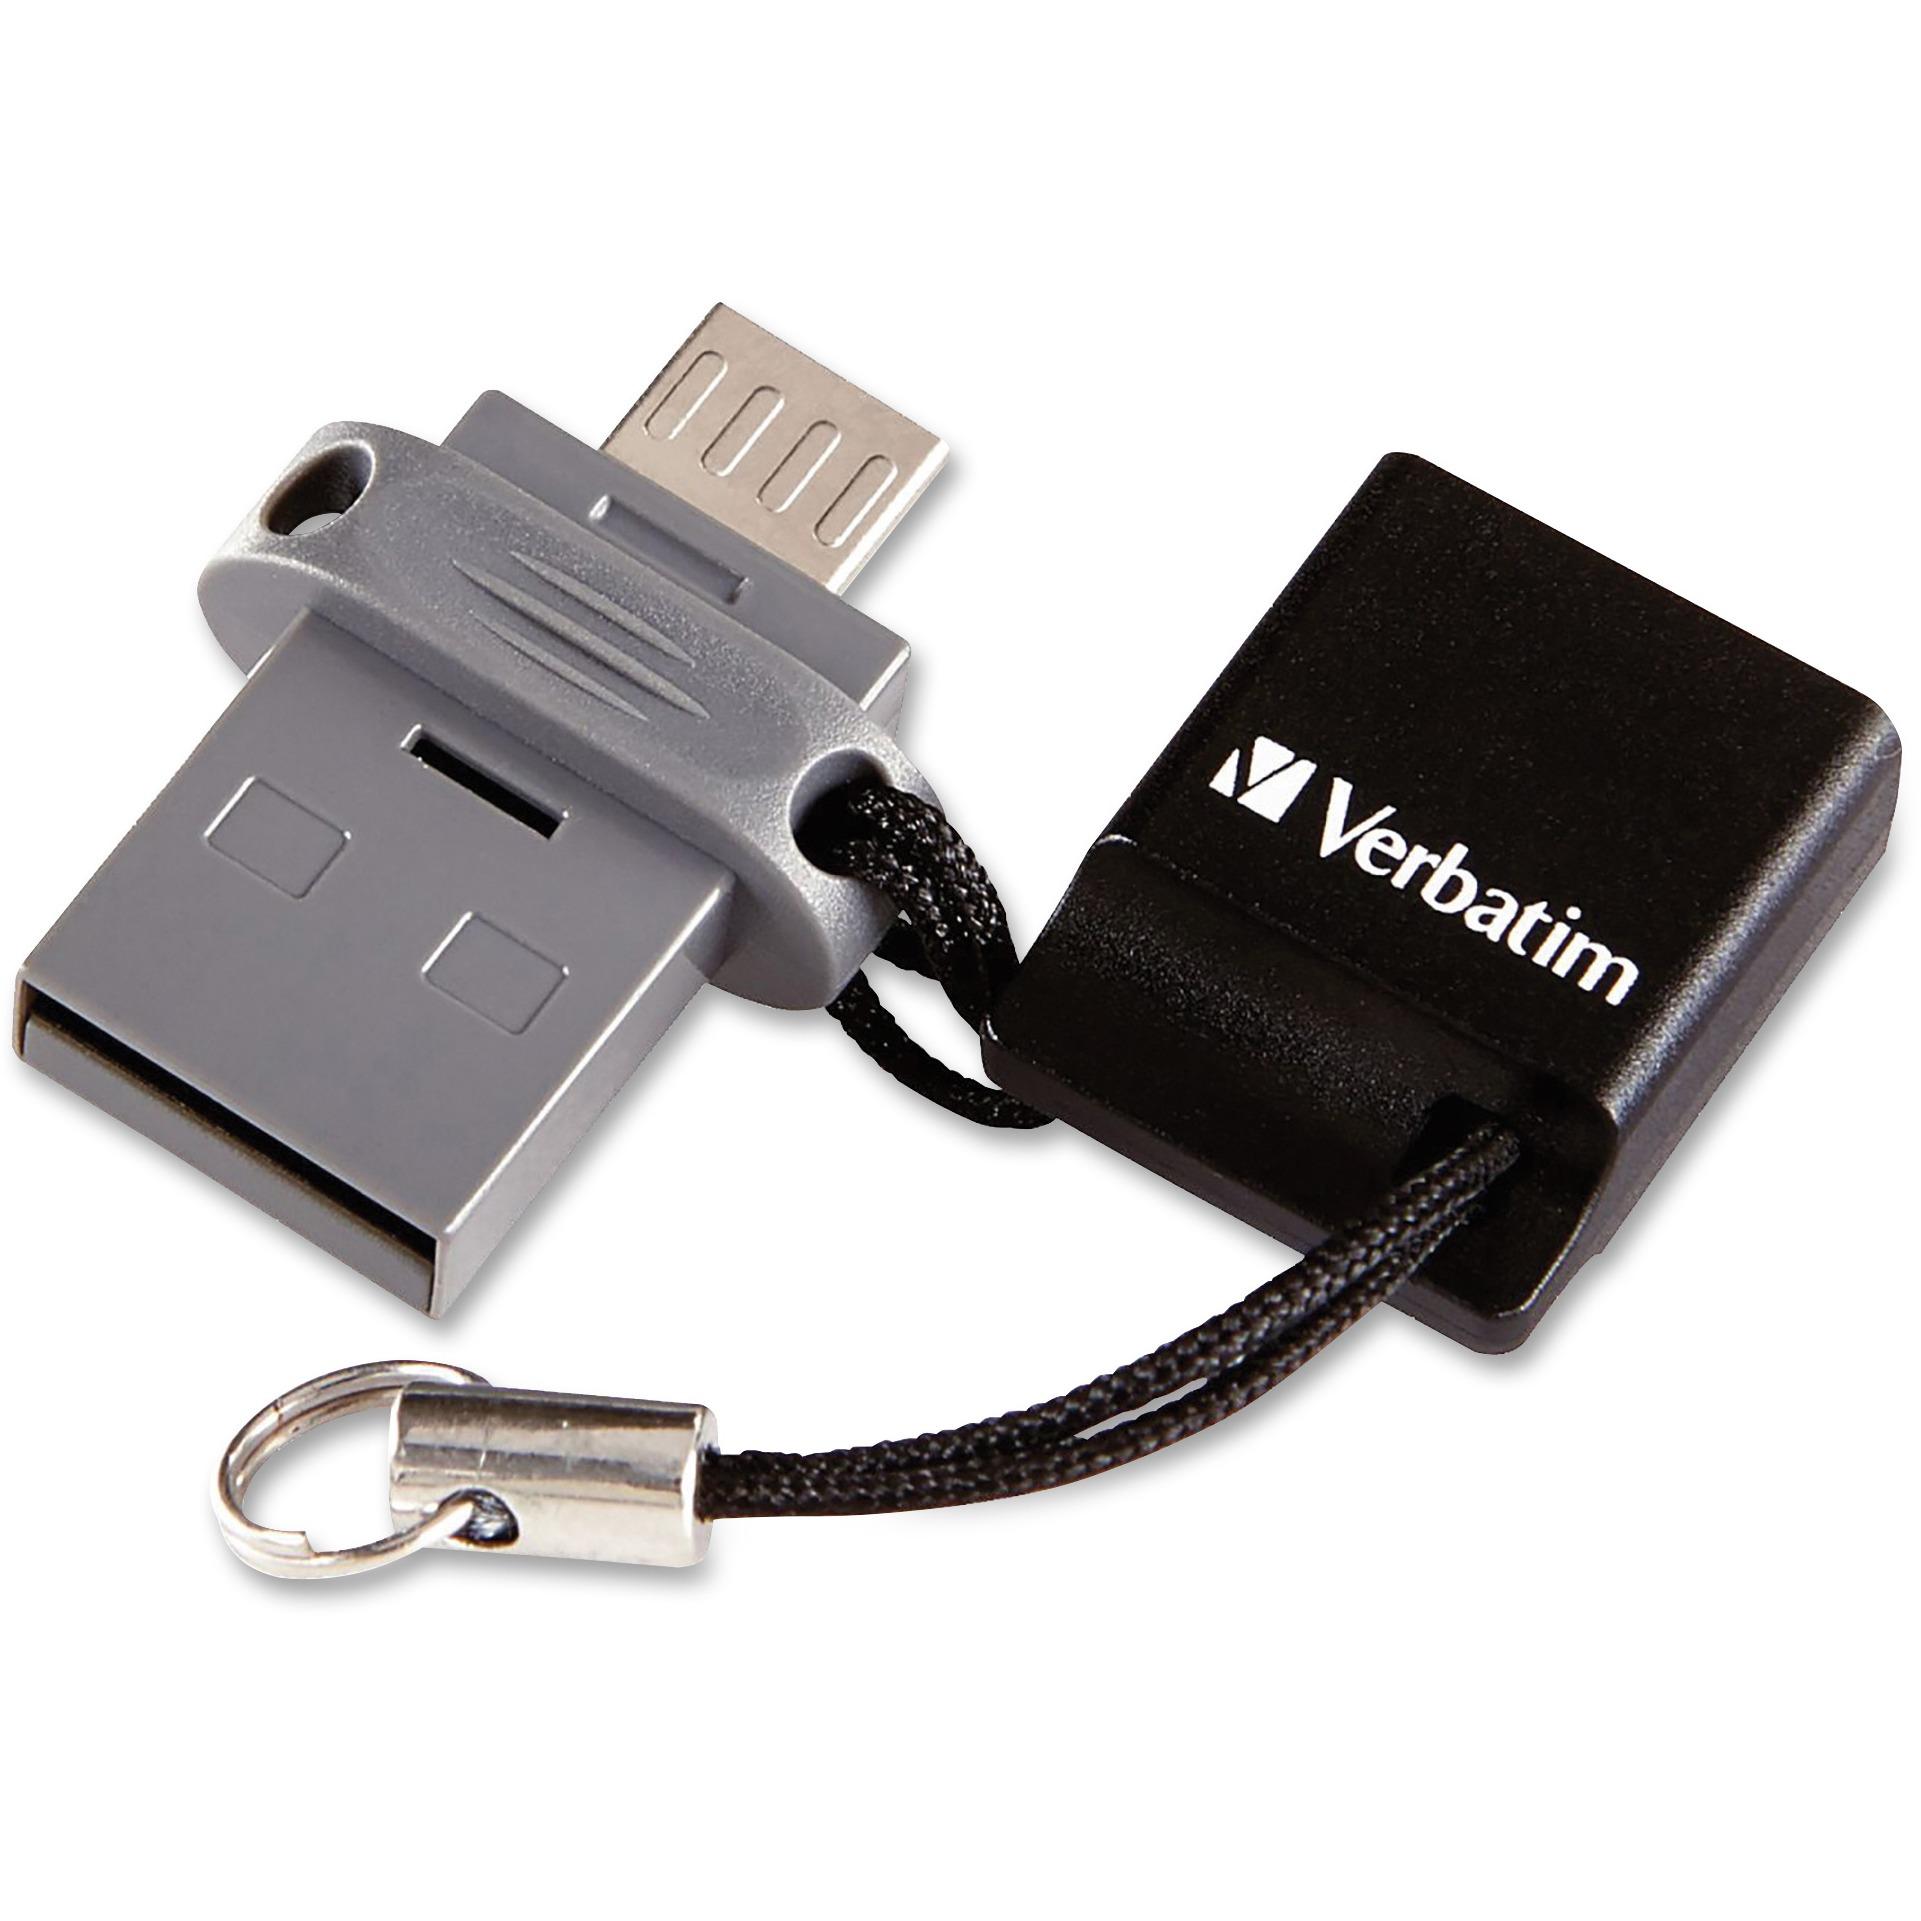 Verbatim, VER99139, 32GB Store 'n' Go Dual USB Flash Drive, 1 Each